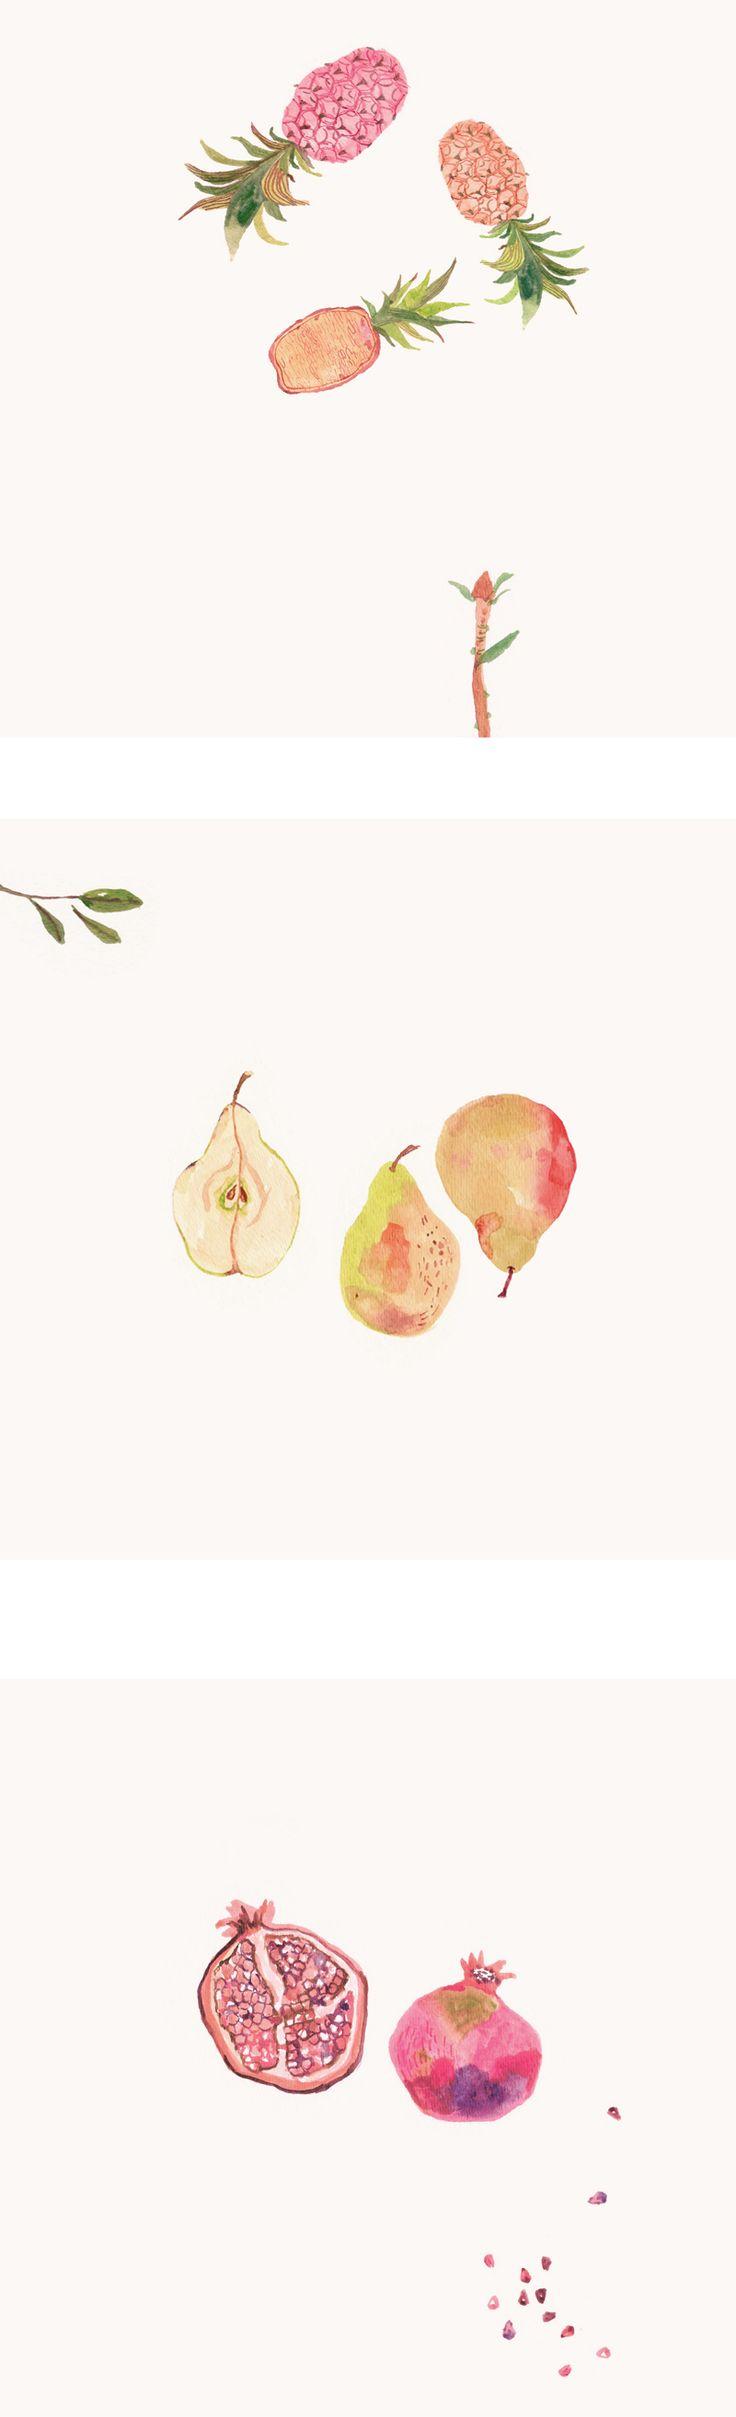 Miji Lee - Pineapples, Pears & Pomegranates